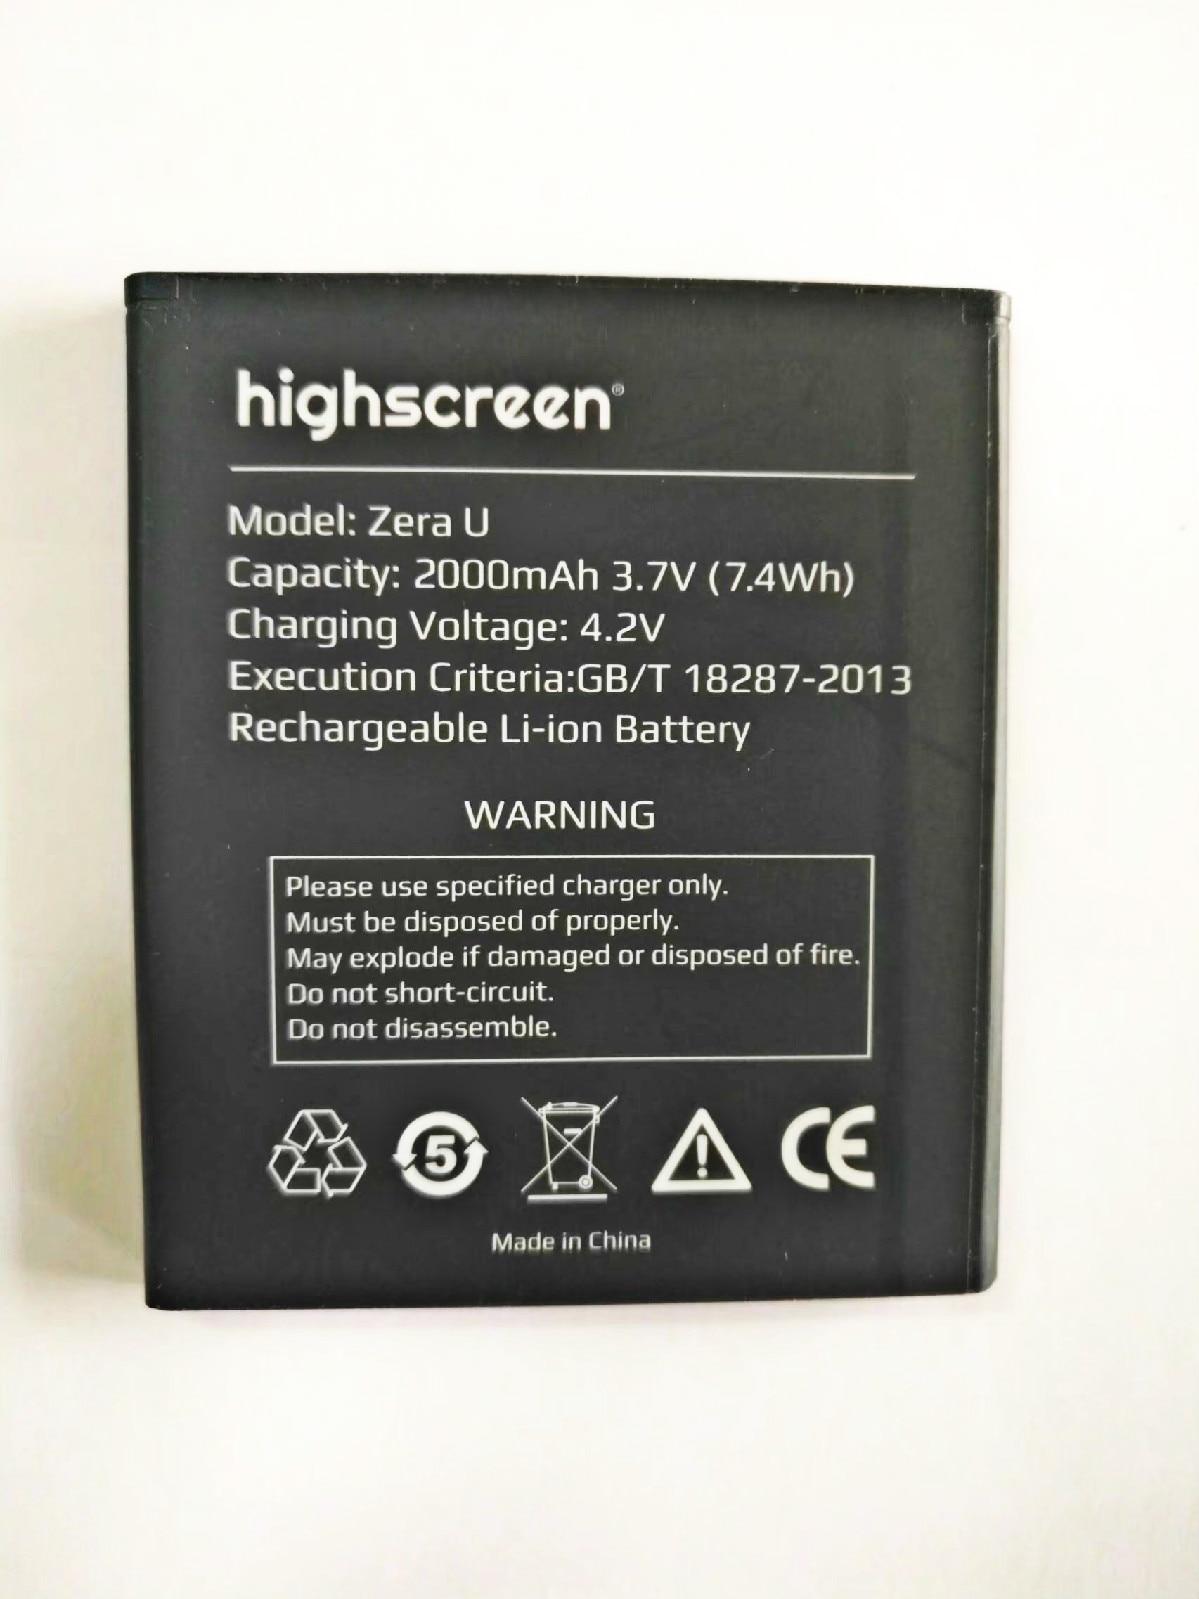 Highscreen Zera U Acumulador de Bateria 2000mAh de Alta Qualidade